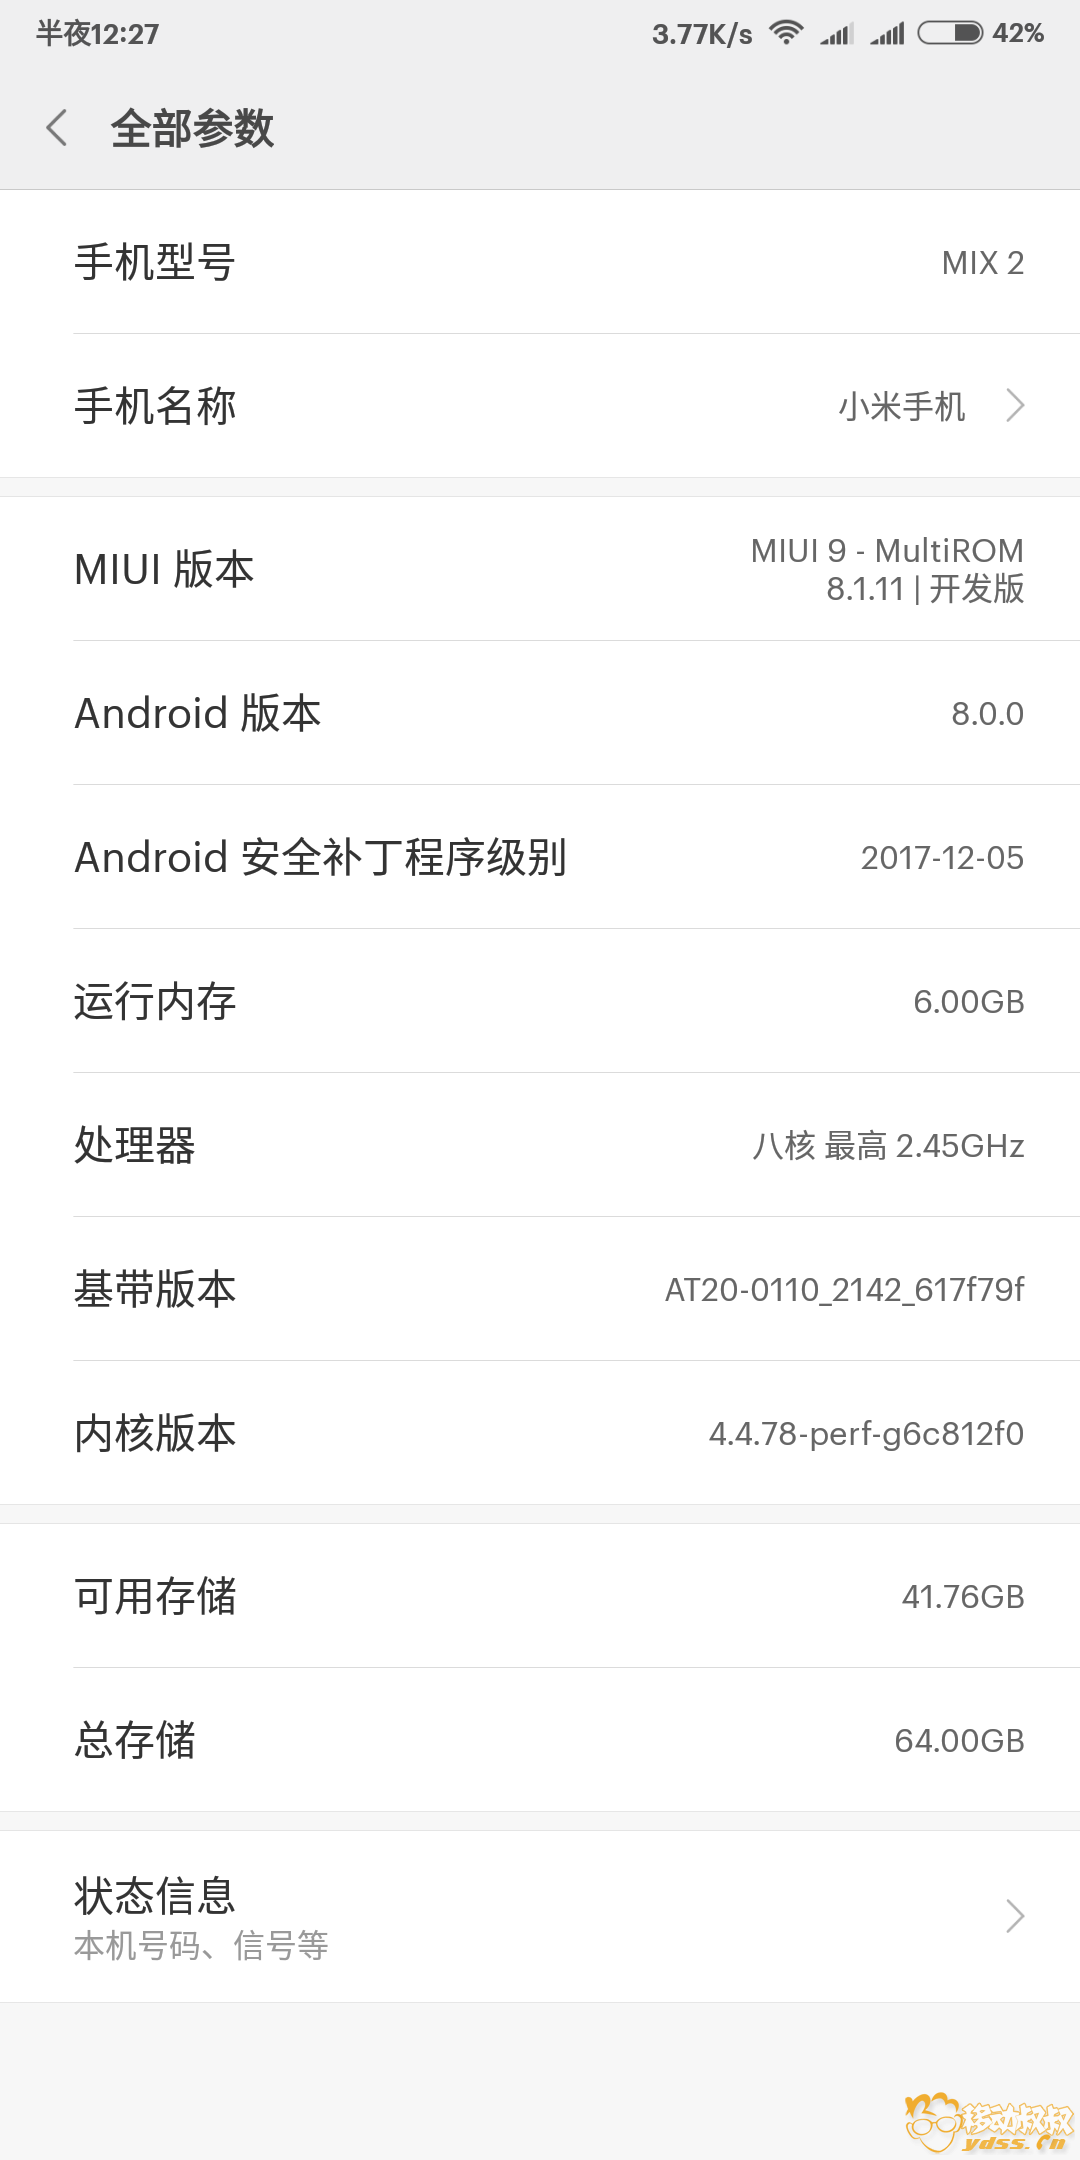 Screenshot_2018-01-18-00-27-23-964_com.android.se.png